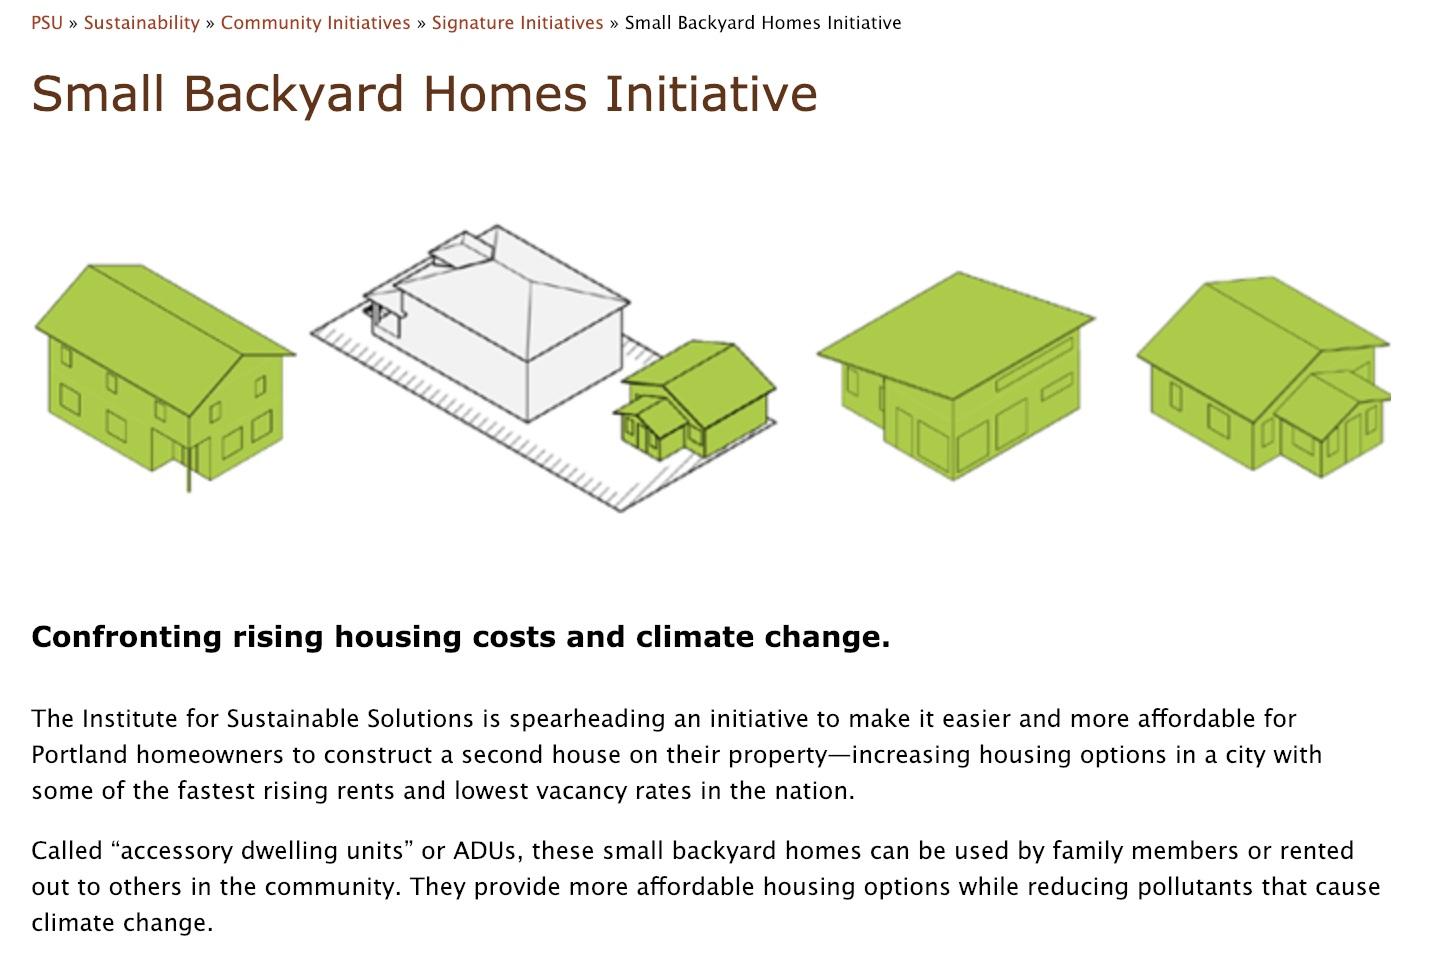 small_backyard_homes_initiative.jpg